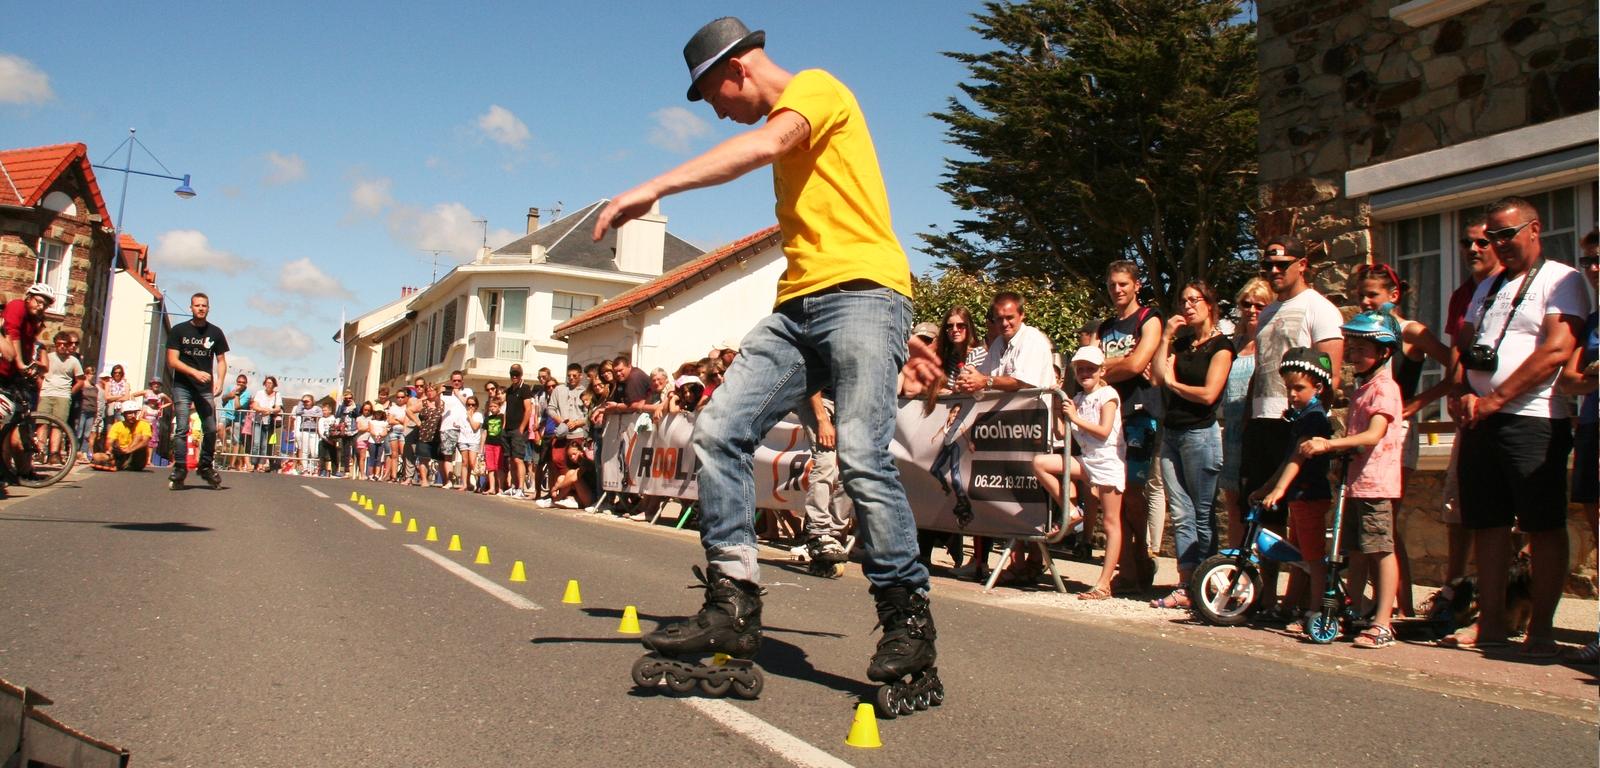 Rool - Démonstration Roller Ken Chalot Slalom freestyle, Spectacle de rue